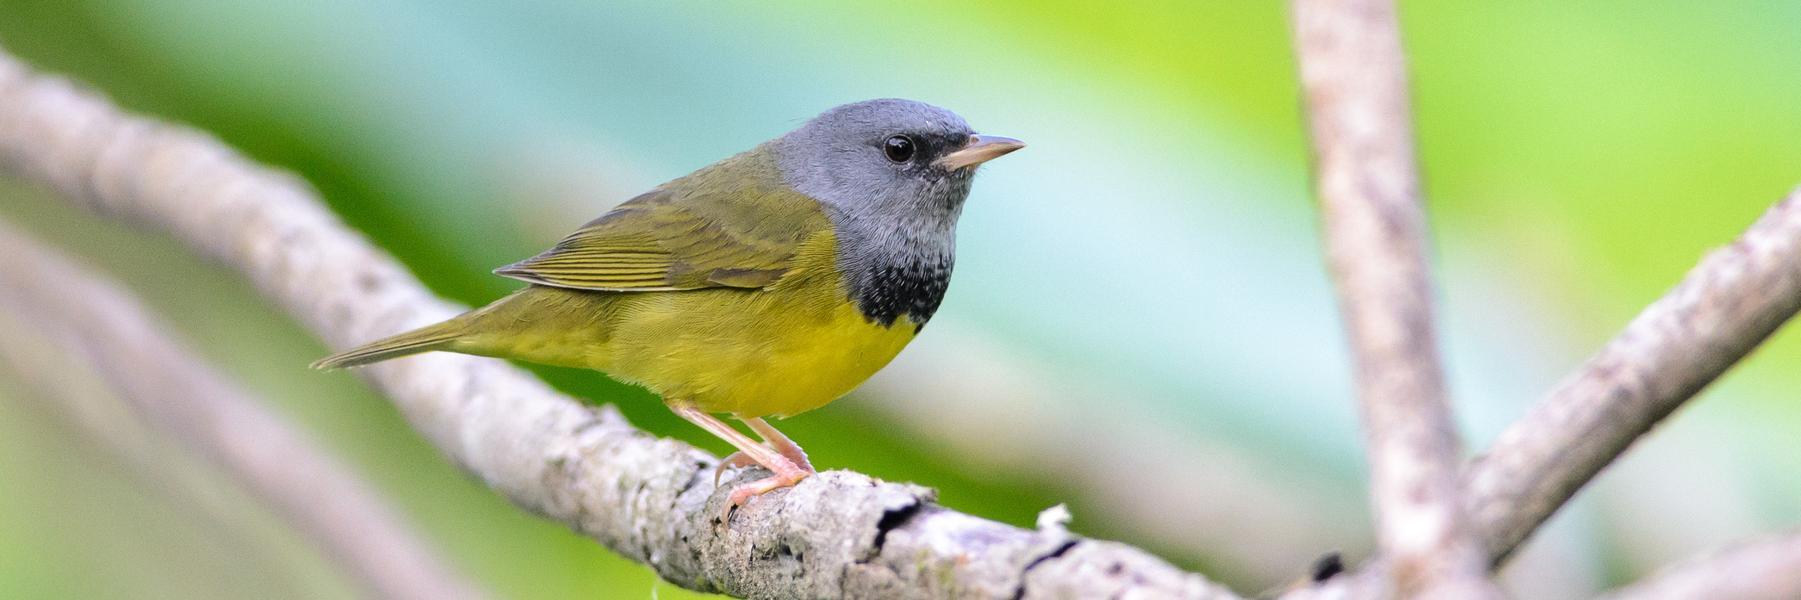 Rangeley Birding Festival